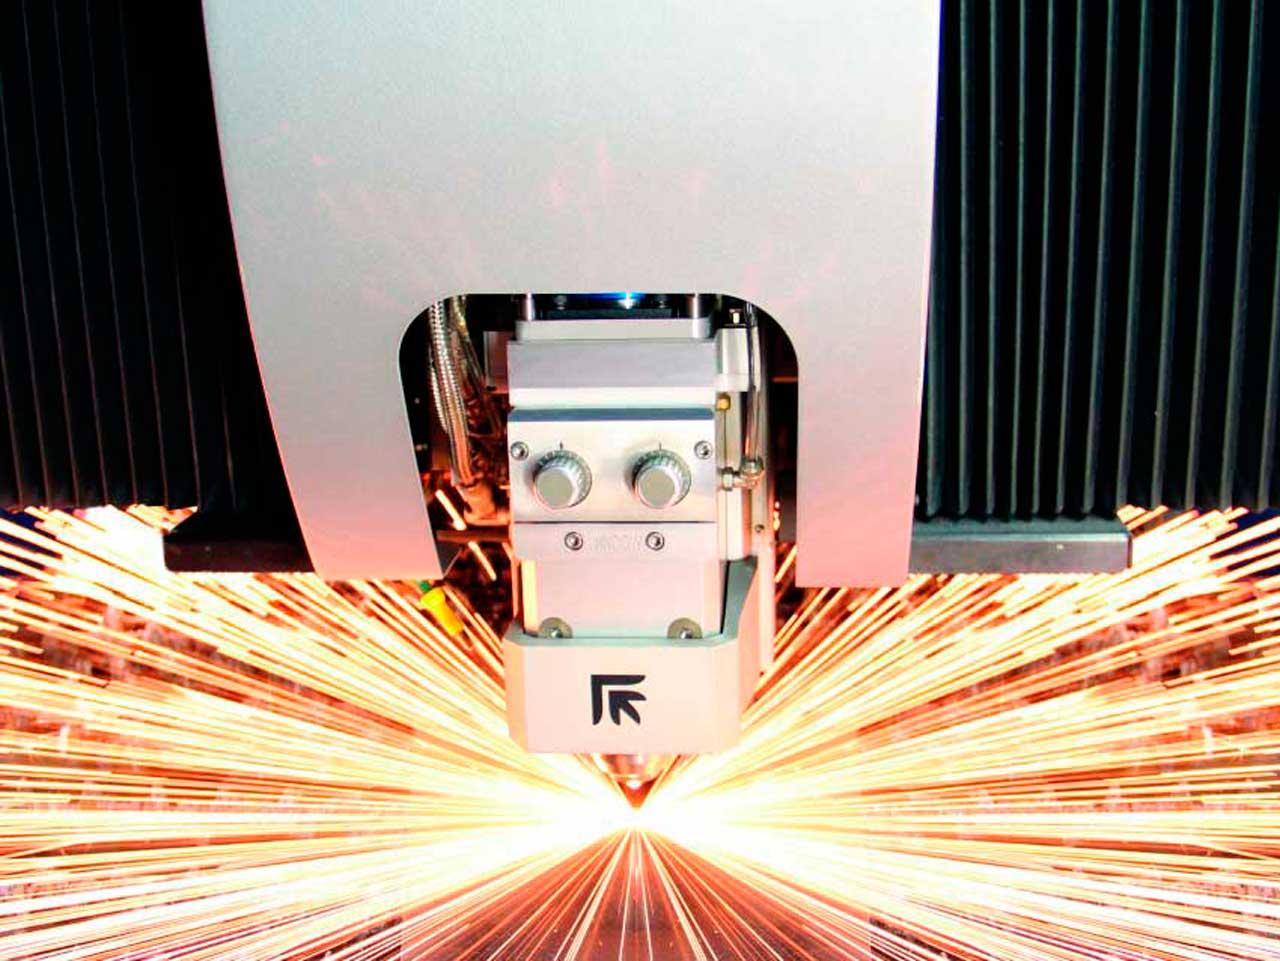 Nueva máquina de corte láser fibra